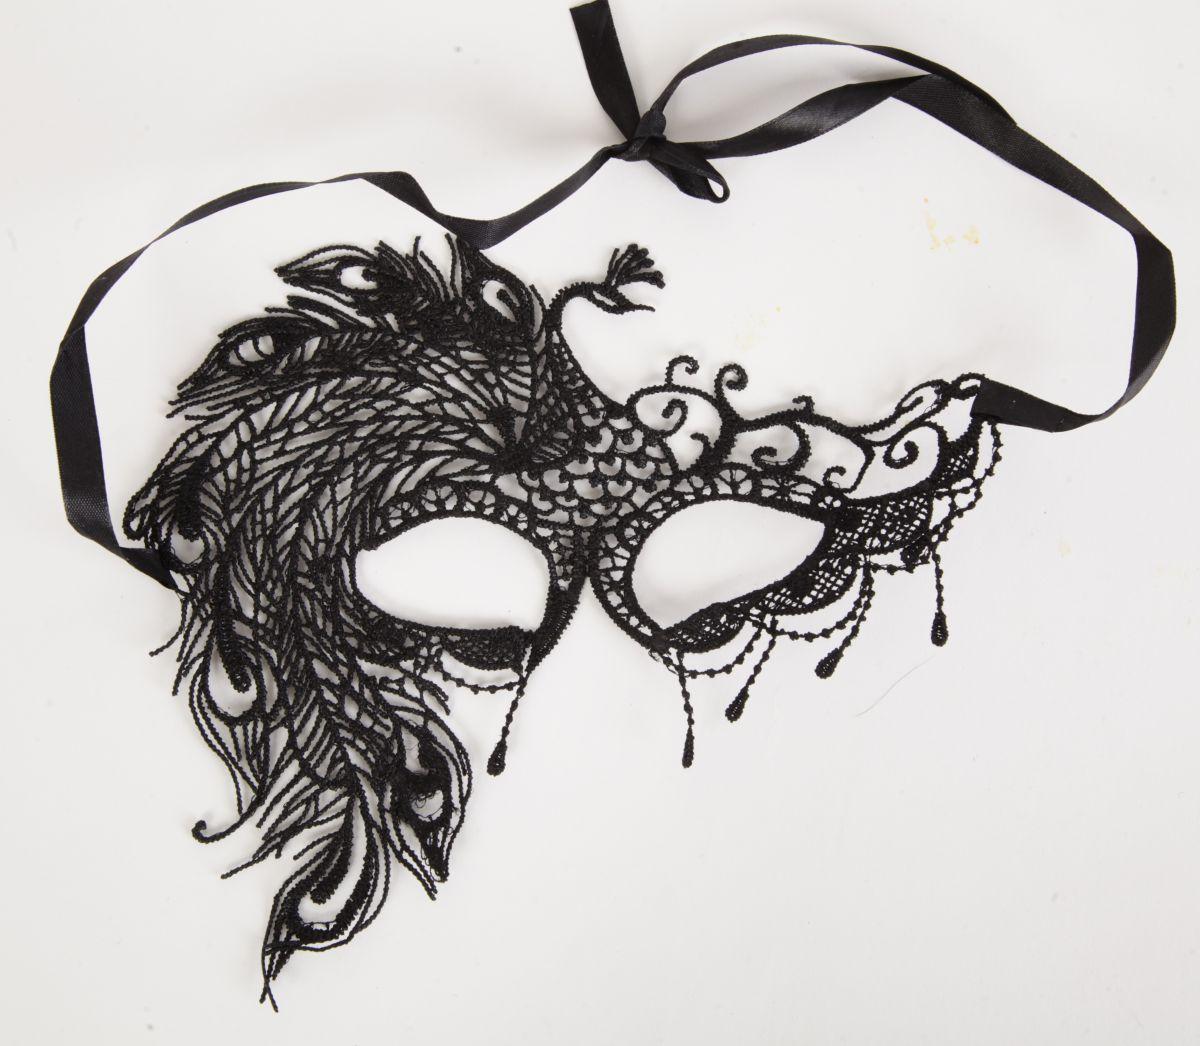 Карнавальная кружевная маска с жар-птицей